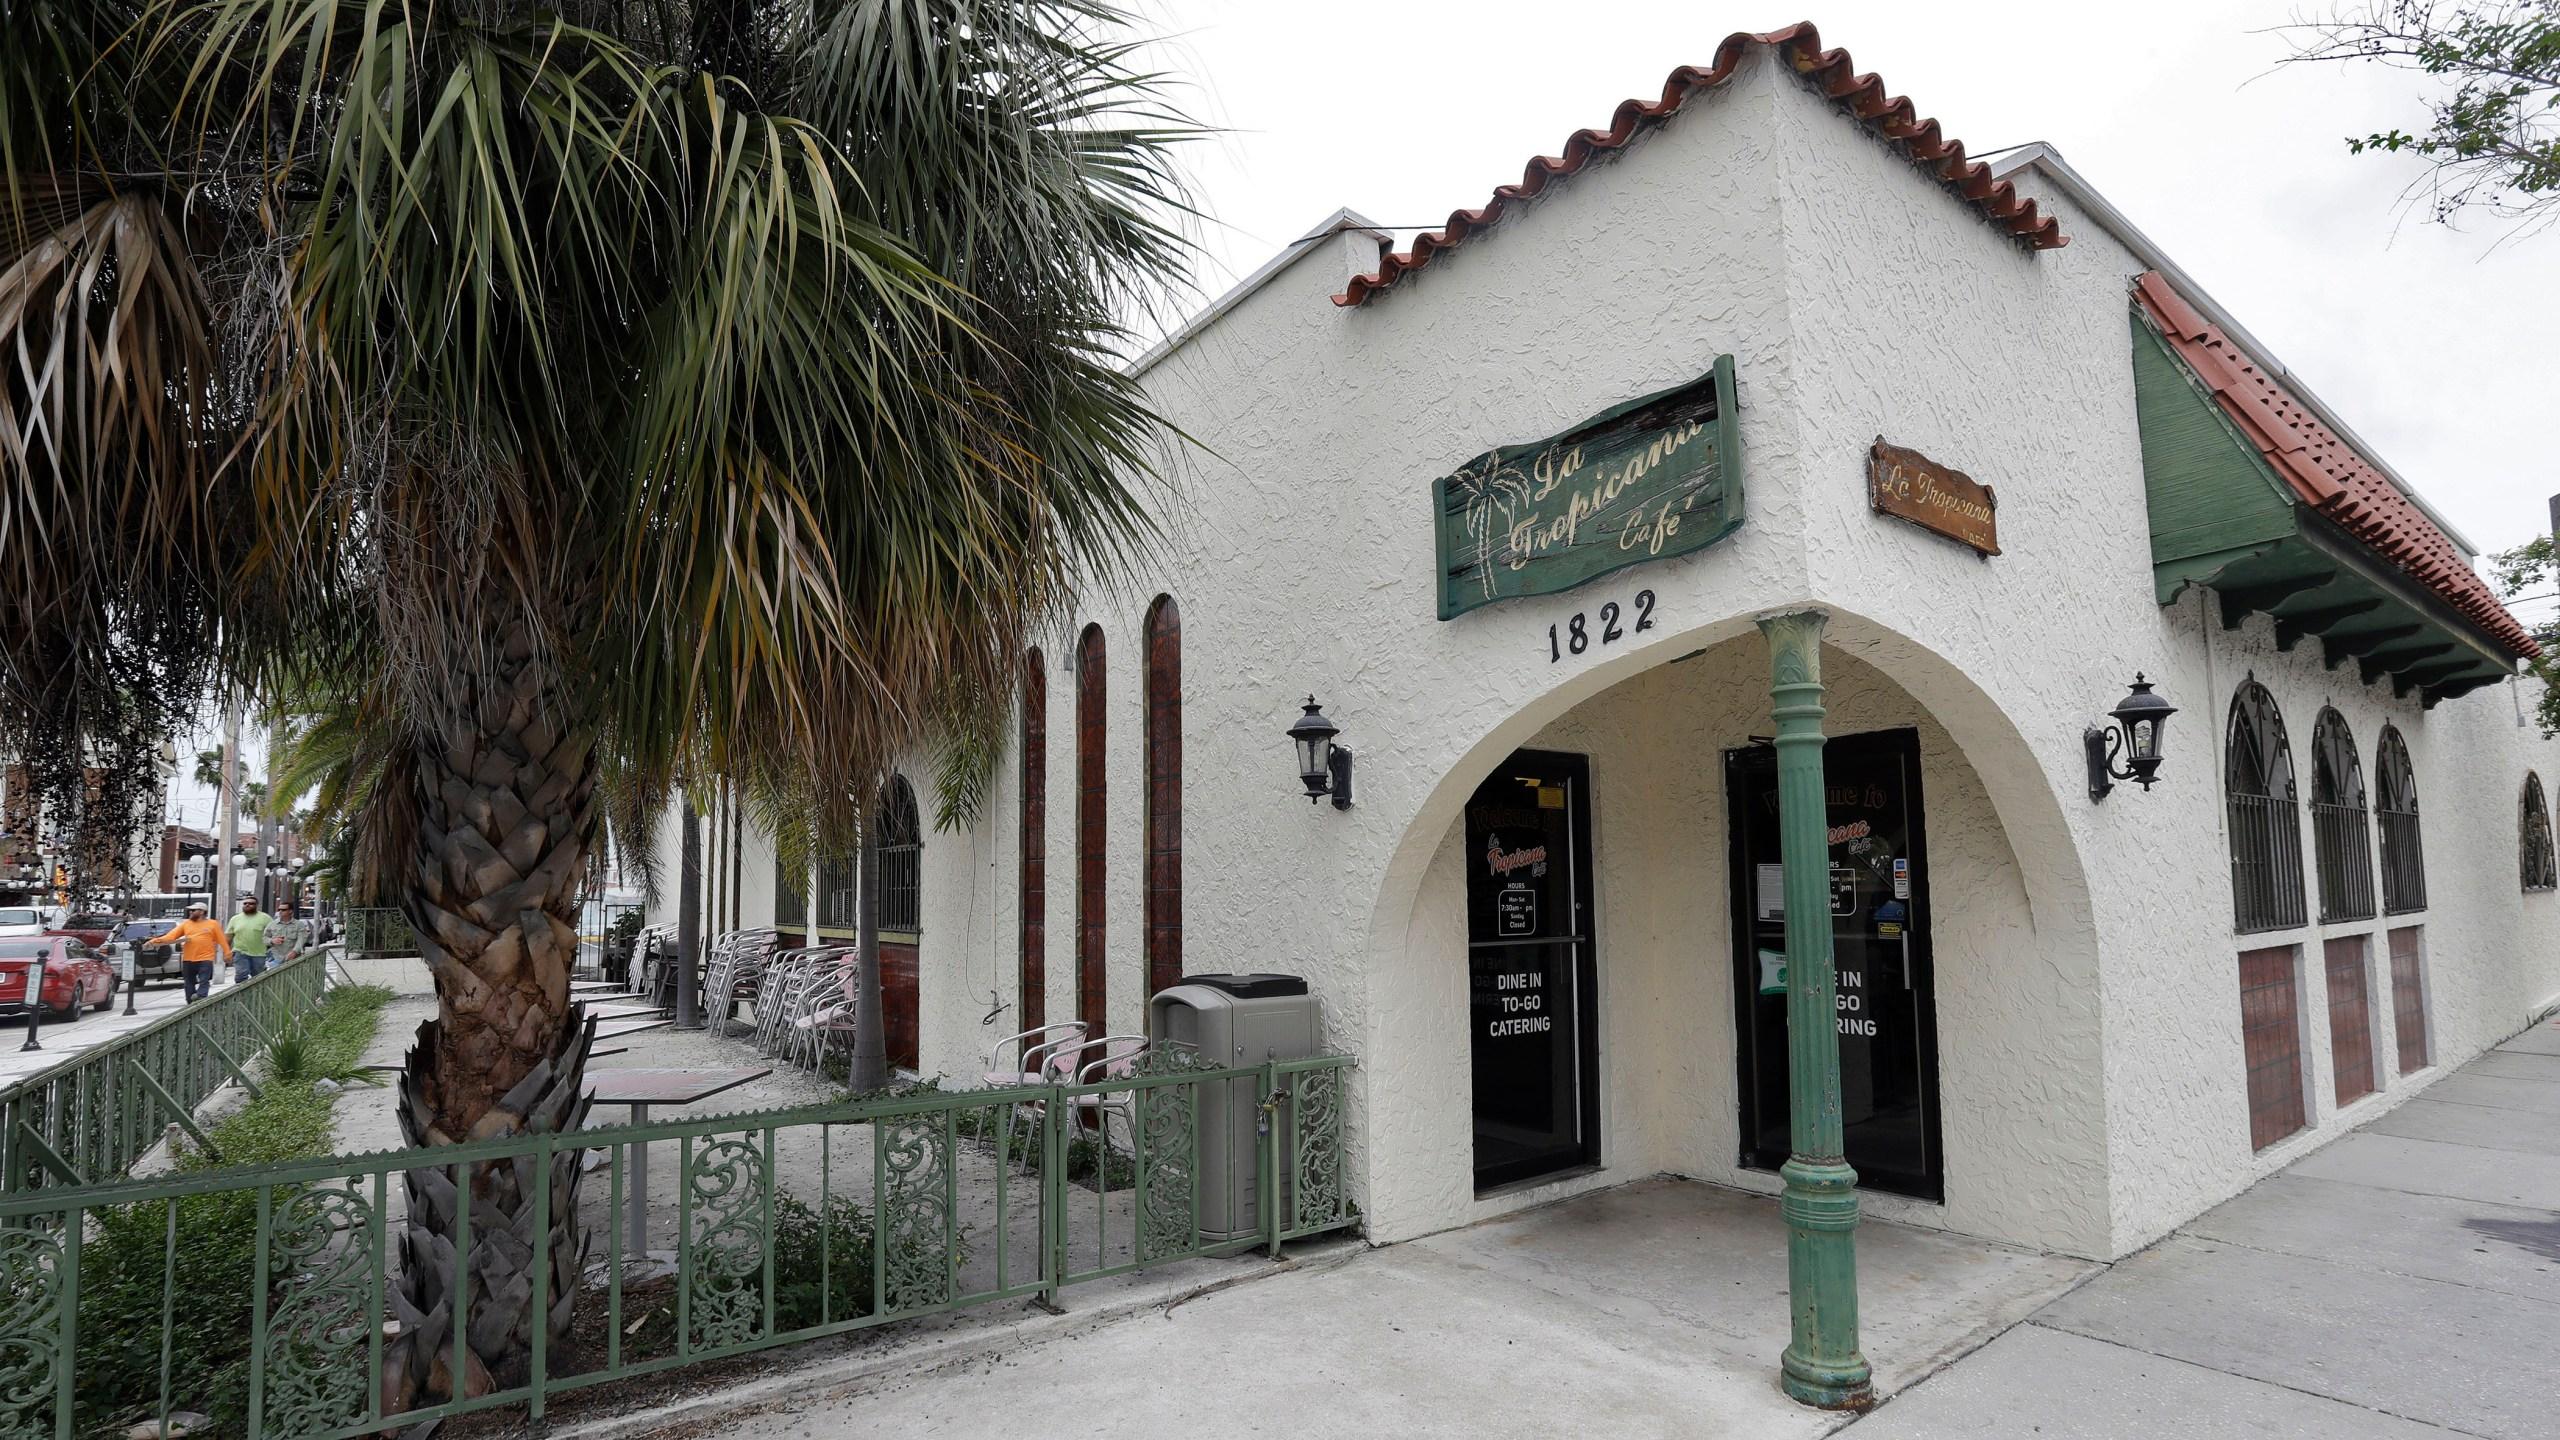 La Tropicana Cafe